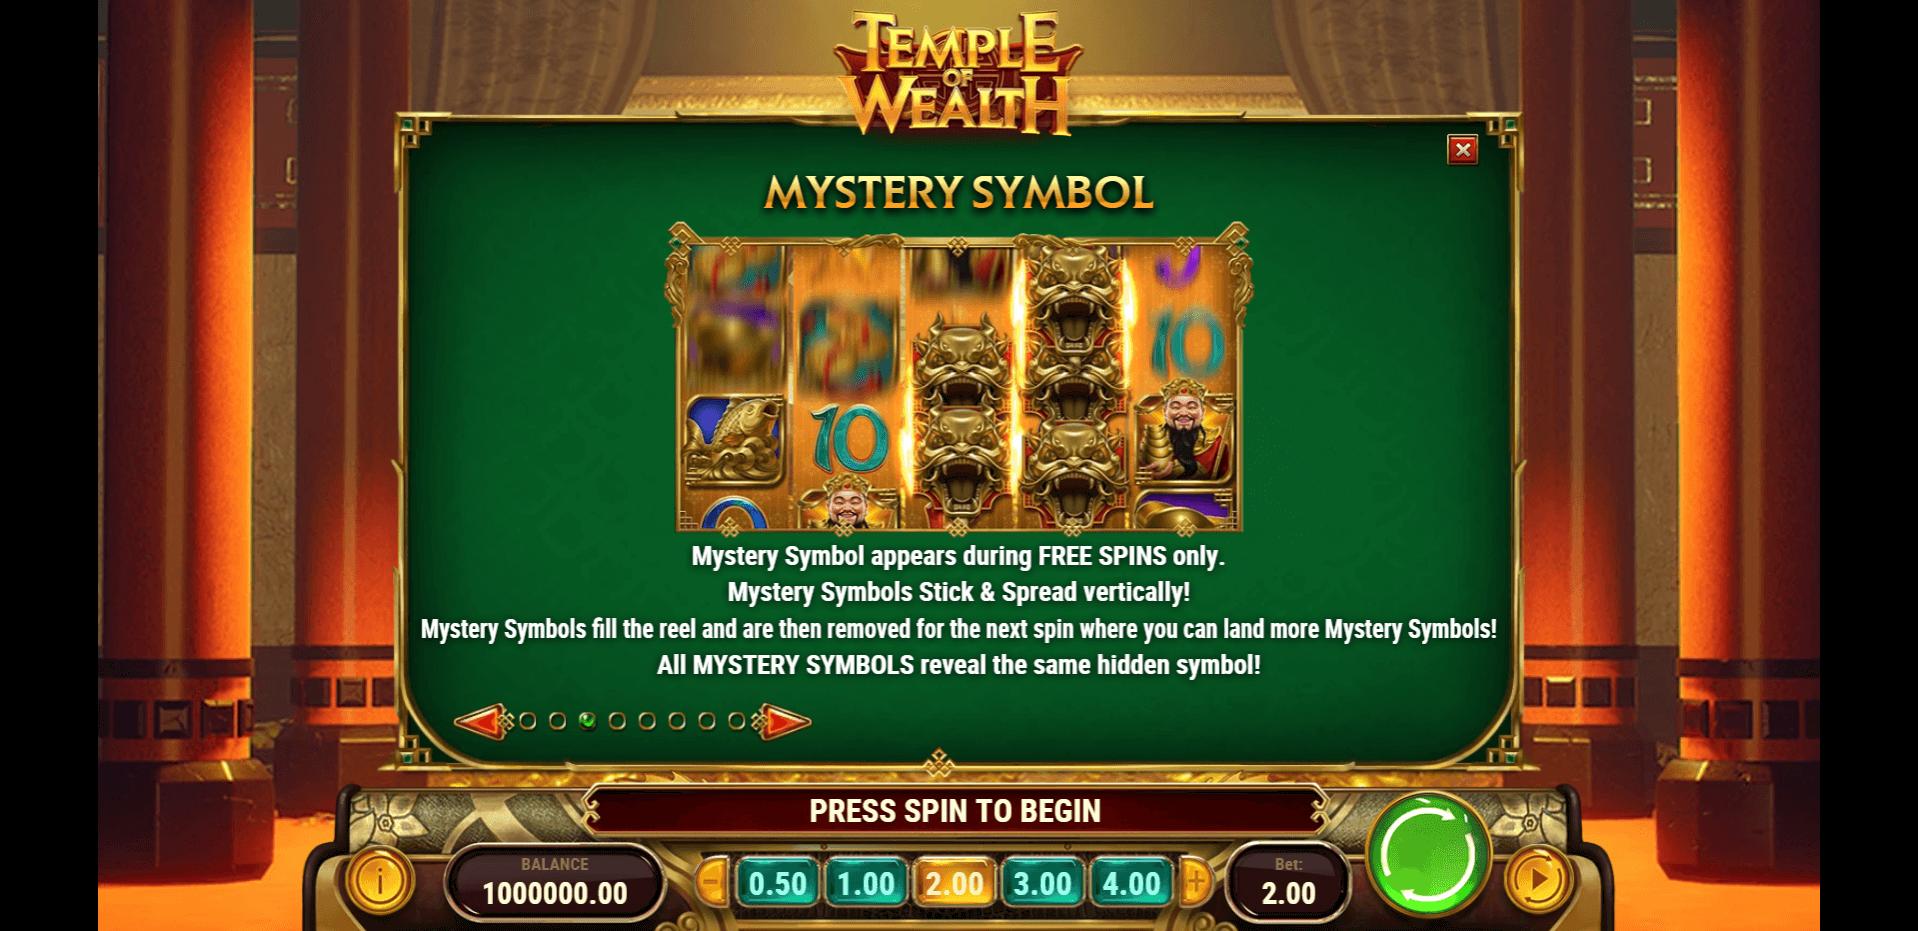 Temple Of Wealth Slot Machine